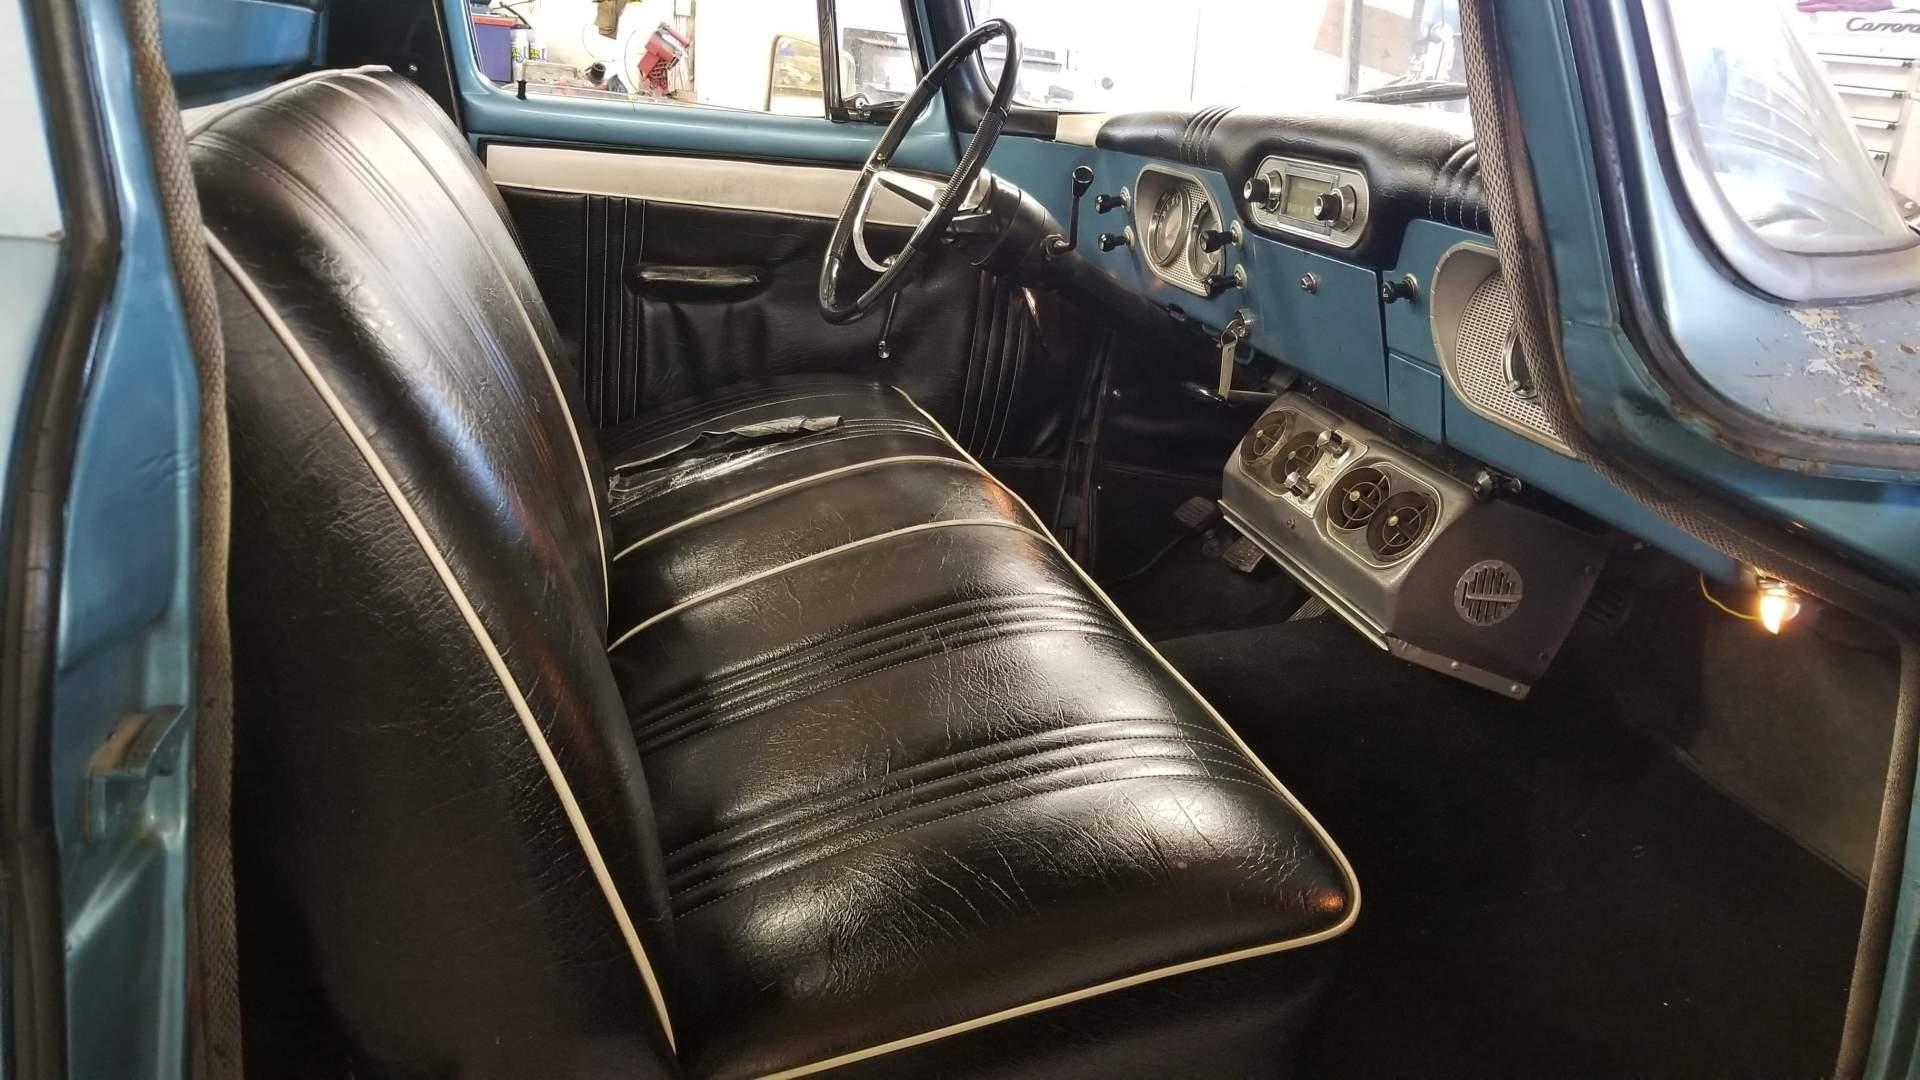 1964-Studebaker-Champ-Pickup-289ci-V8-4